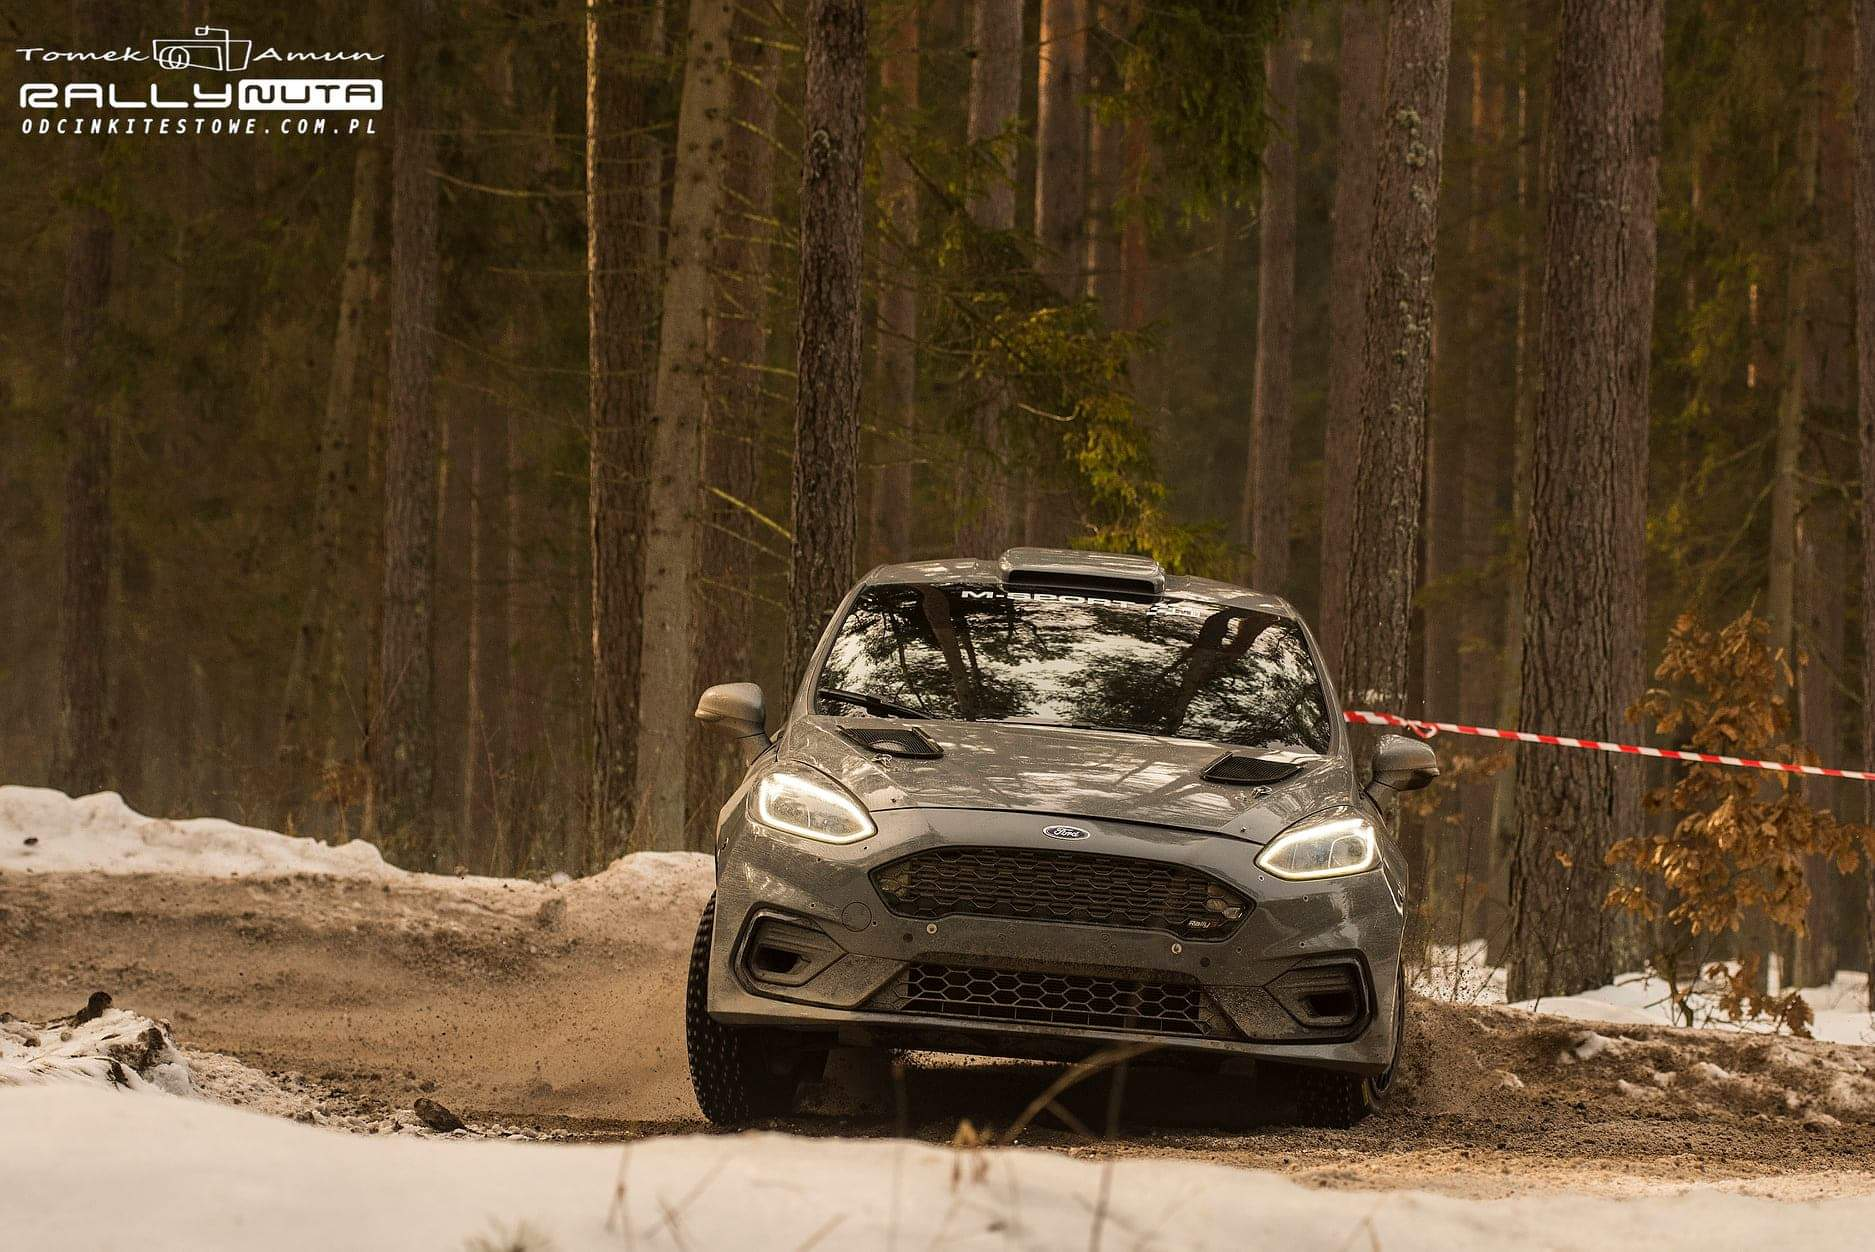 FIA European Rally Championship: Temporada 2021 - Página 3 Eu8GRxkXMAYBn9s?format=jpg&name=large